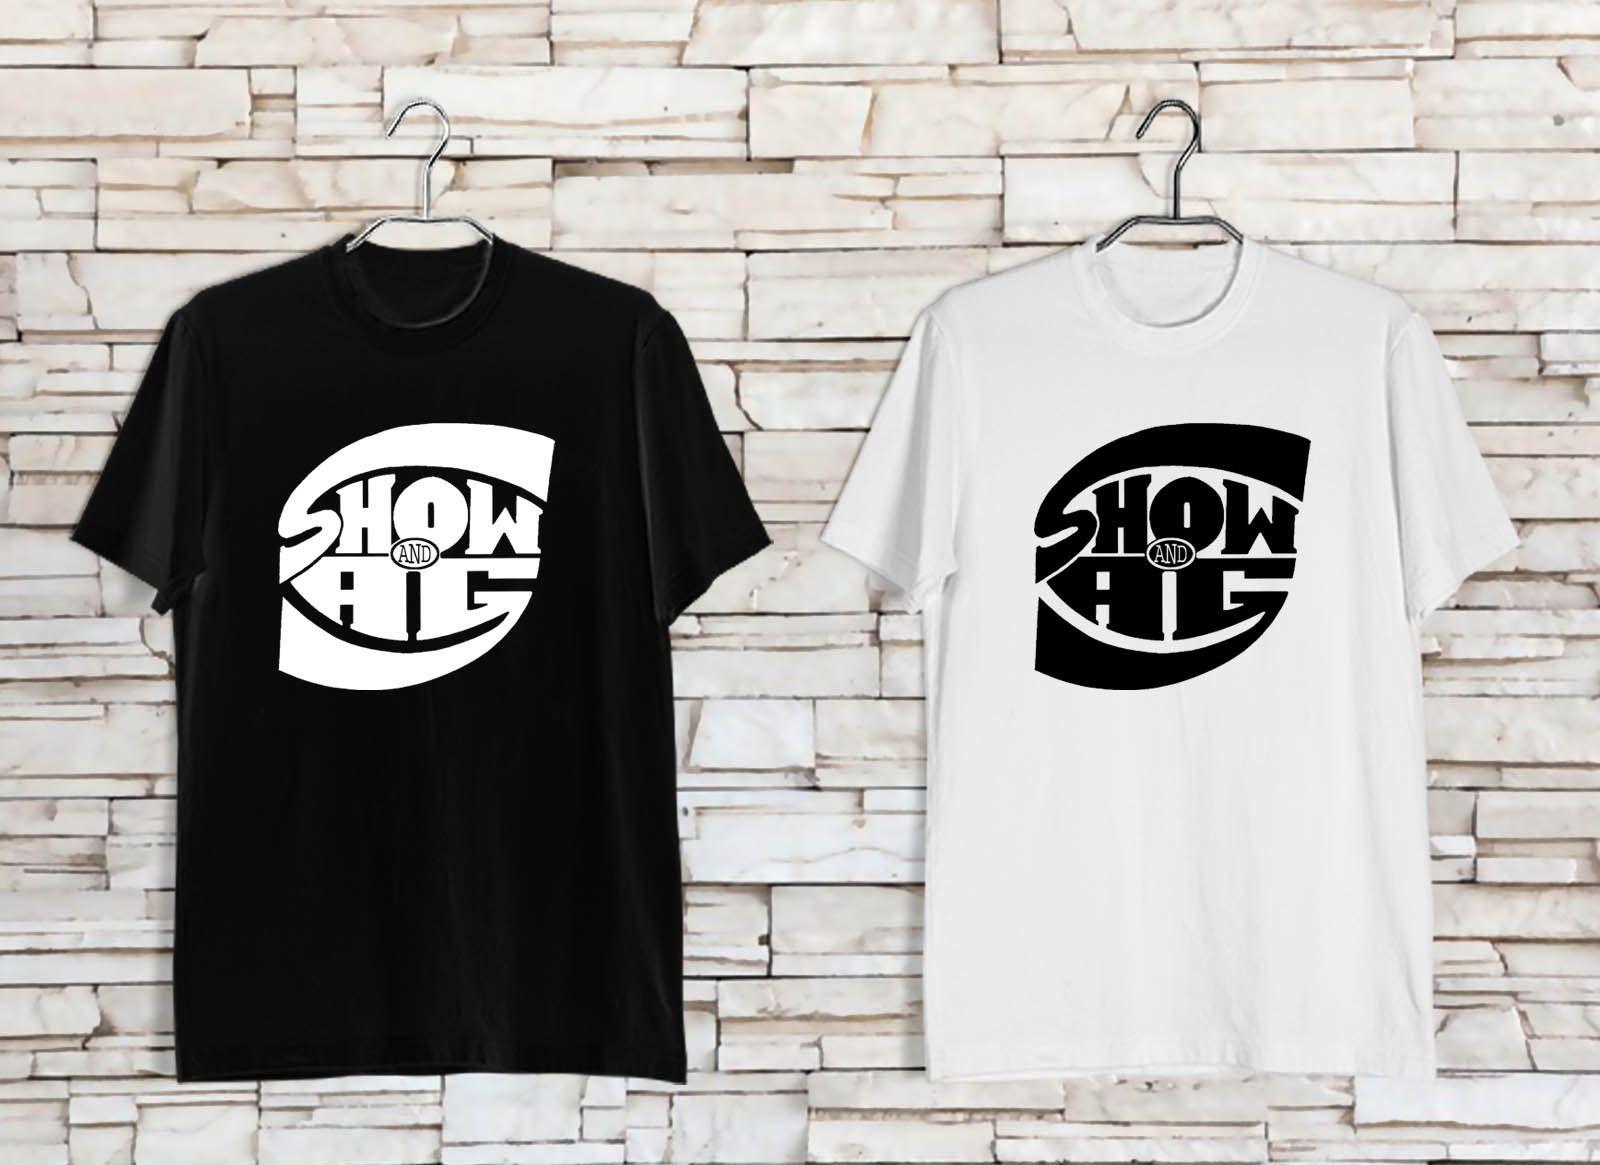 ffae3ce2d86c Compre SHOW Y AG Rap Hip Hop Music Camisetas Clásicas Camiseta  Personalizada Jersey Camiseta Sudadera Con Capucha Hip Hop Camiseta  Chaqueta Croacia Camiseta ...